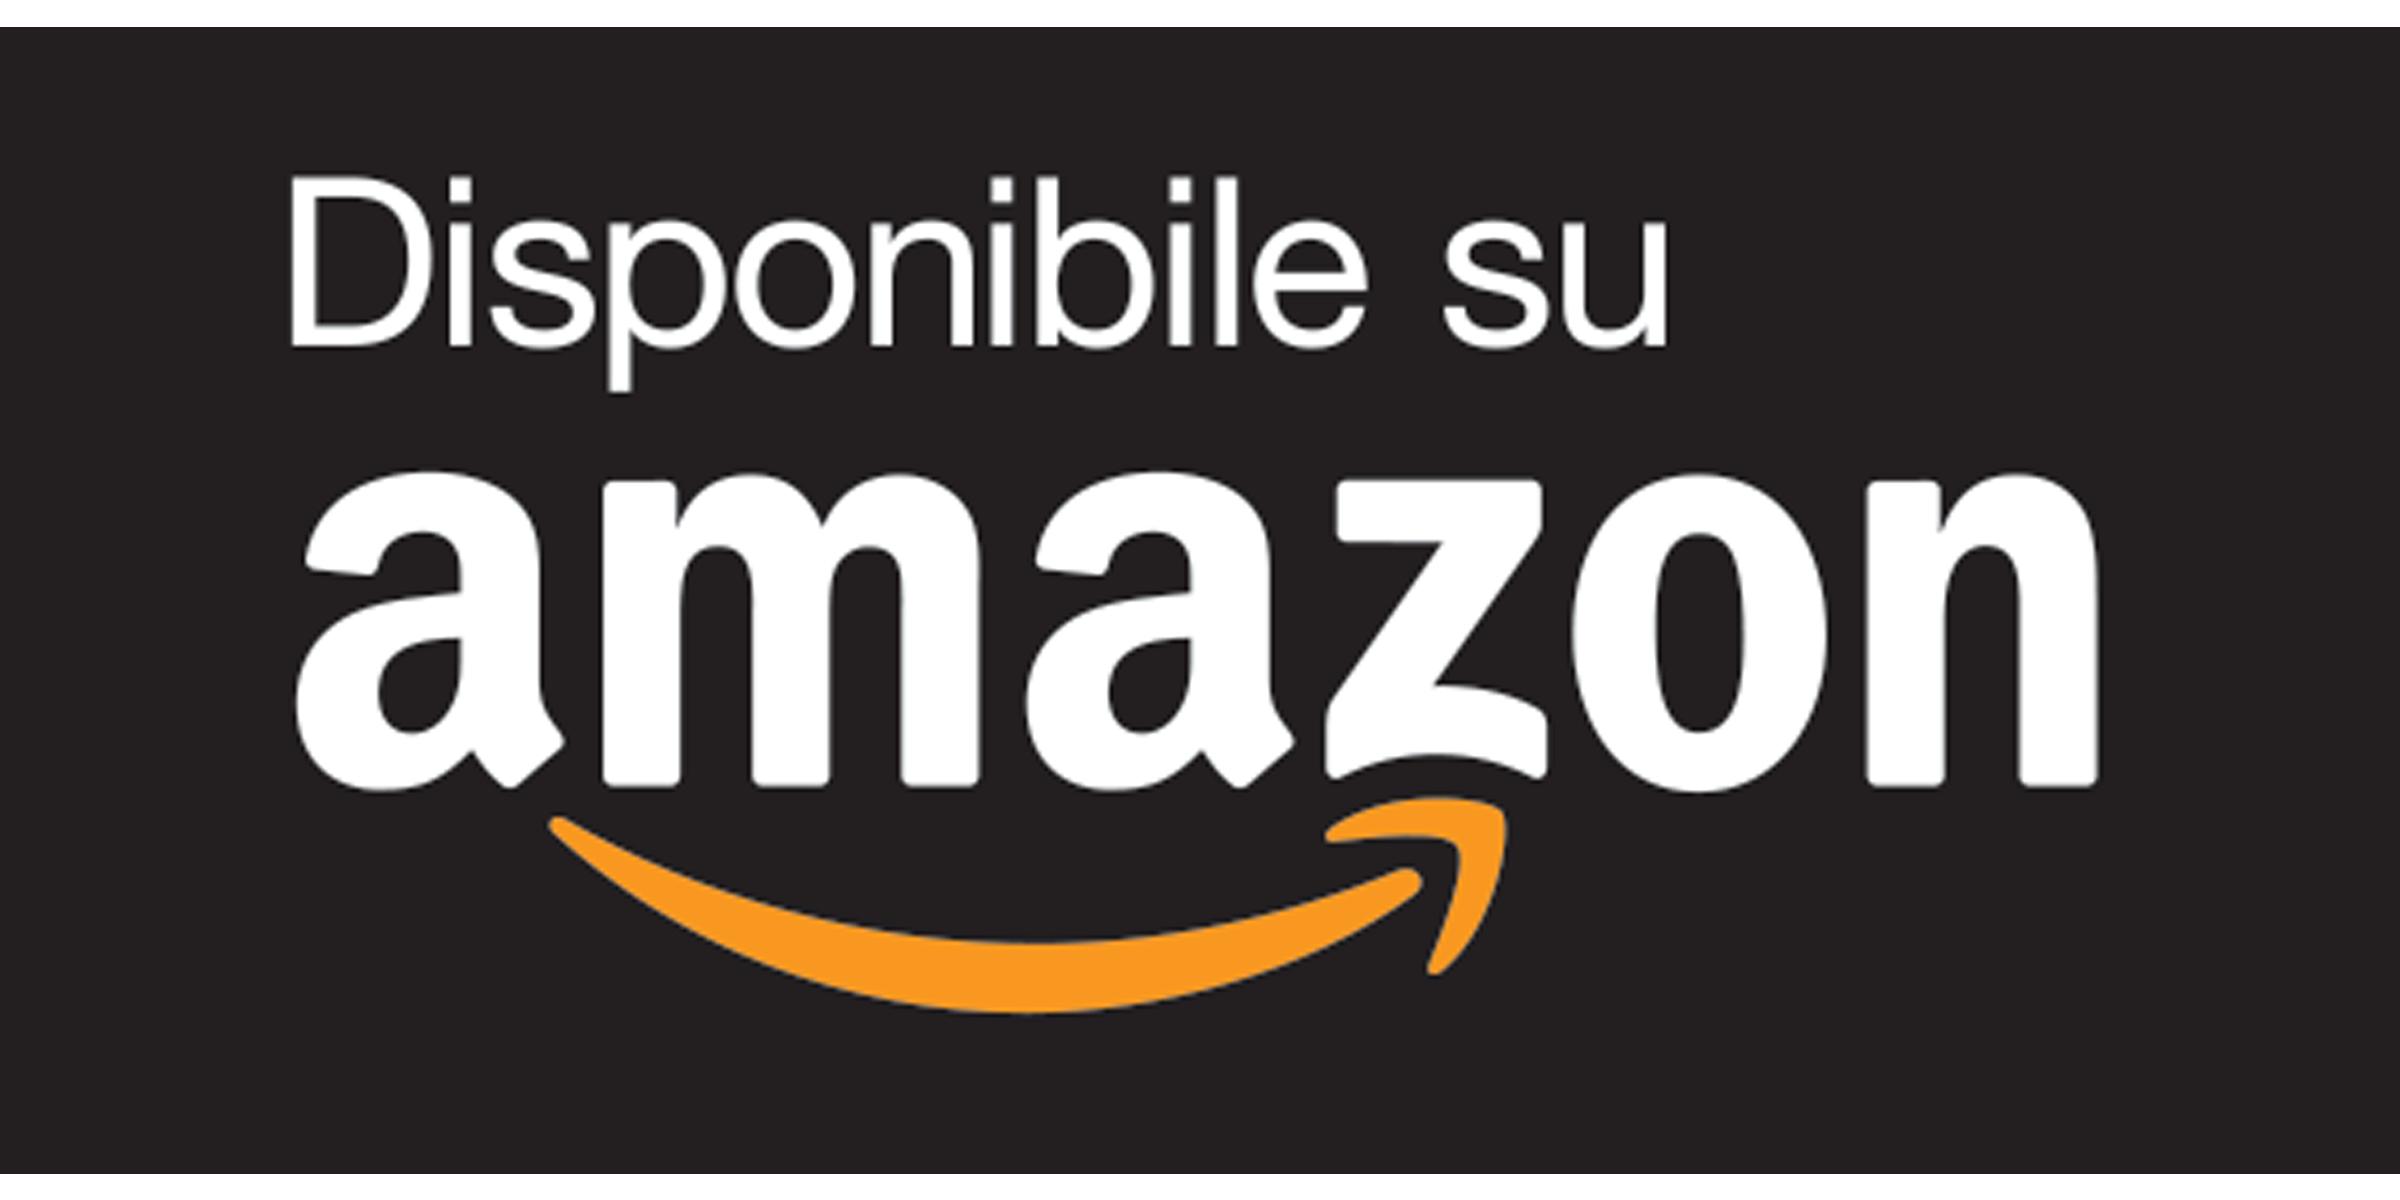 https://www.amazon.it/stores/Xiaomi/page/047A5C78-0892-406B-8368-2FFD44B724DF?ref_=ast_bln